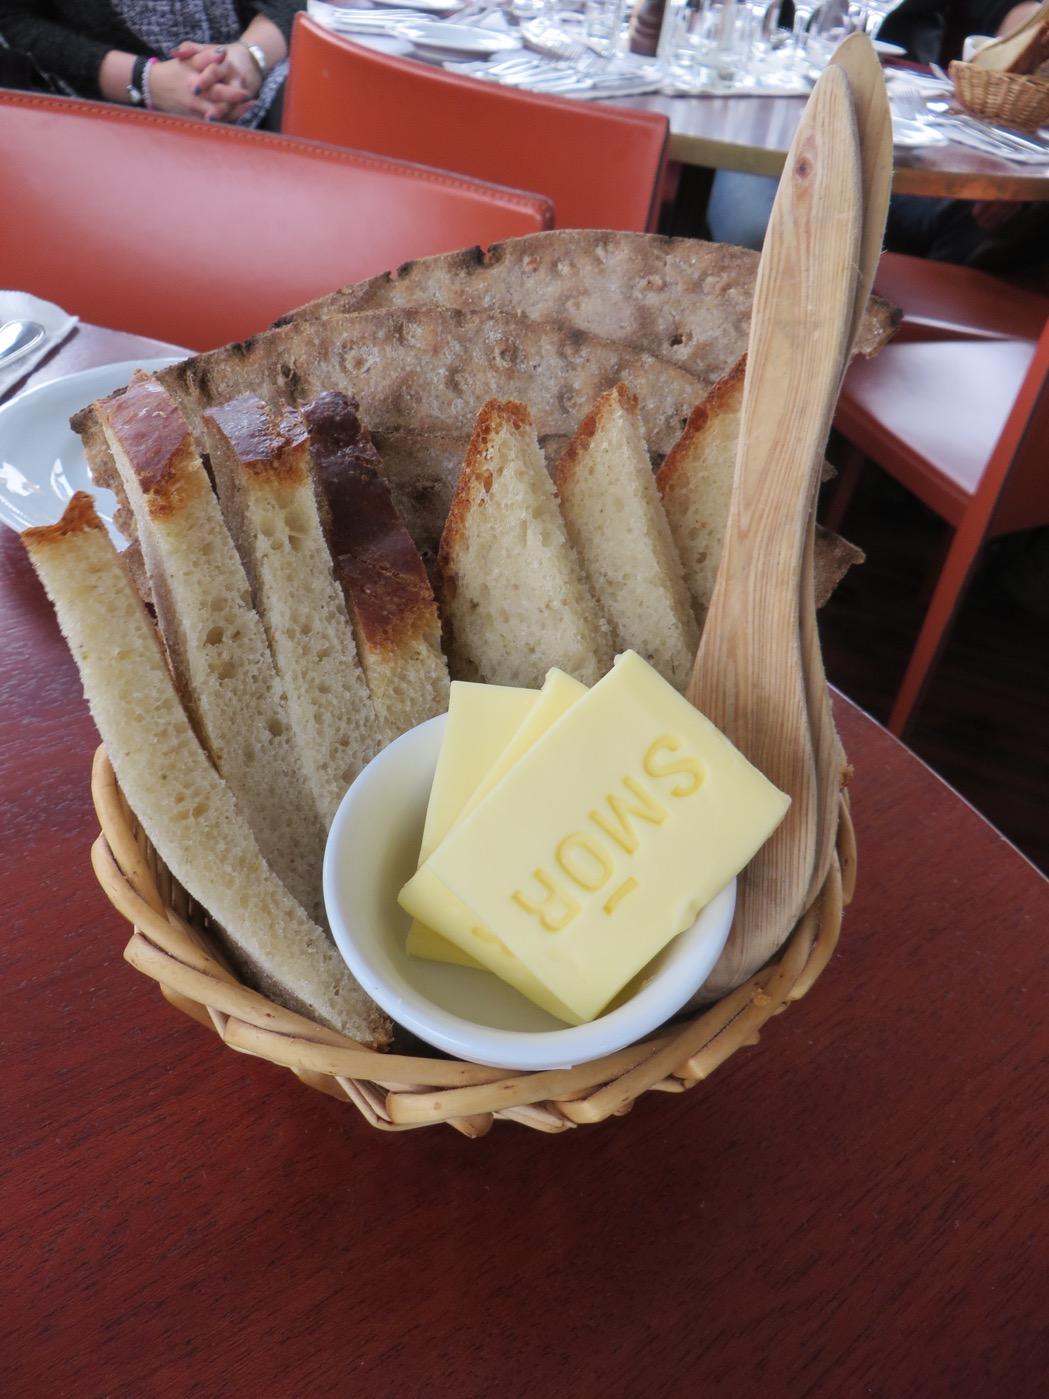 Hembakt smakrikt bröd.